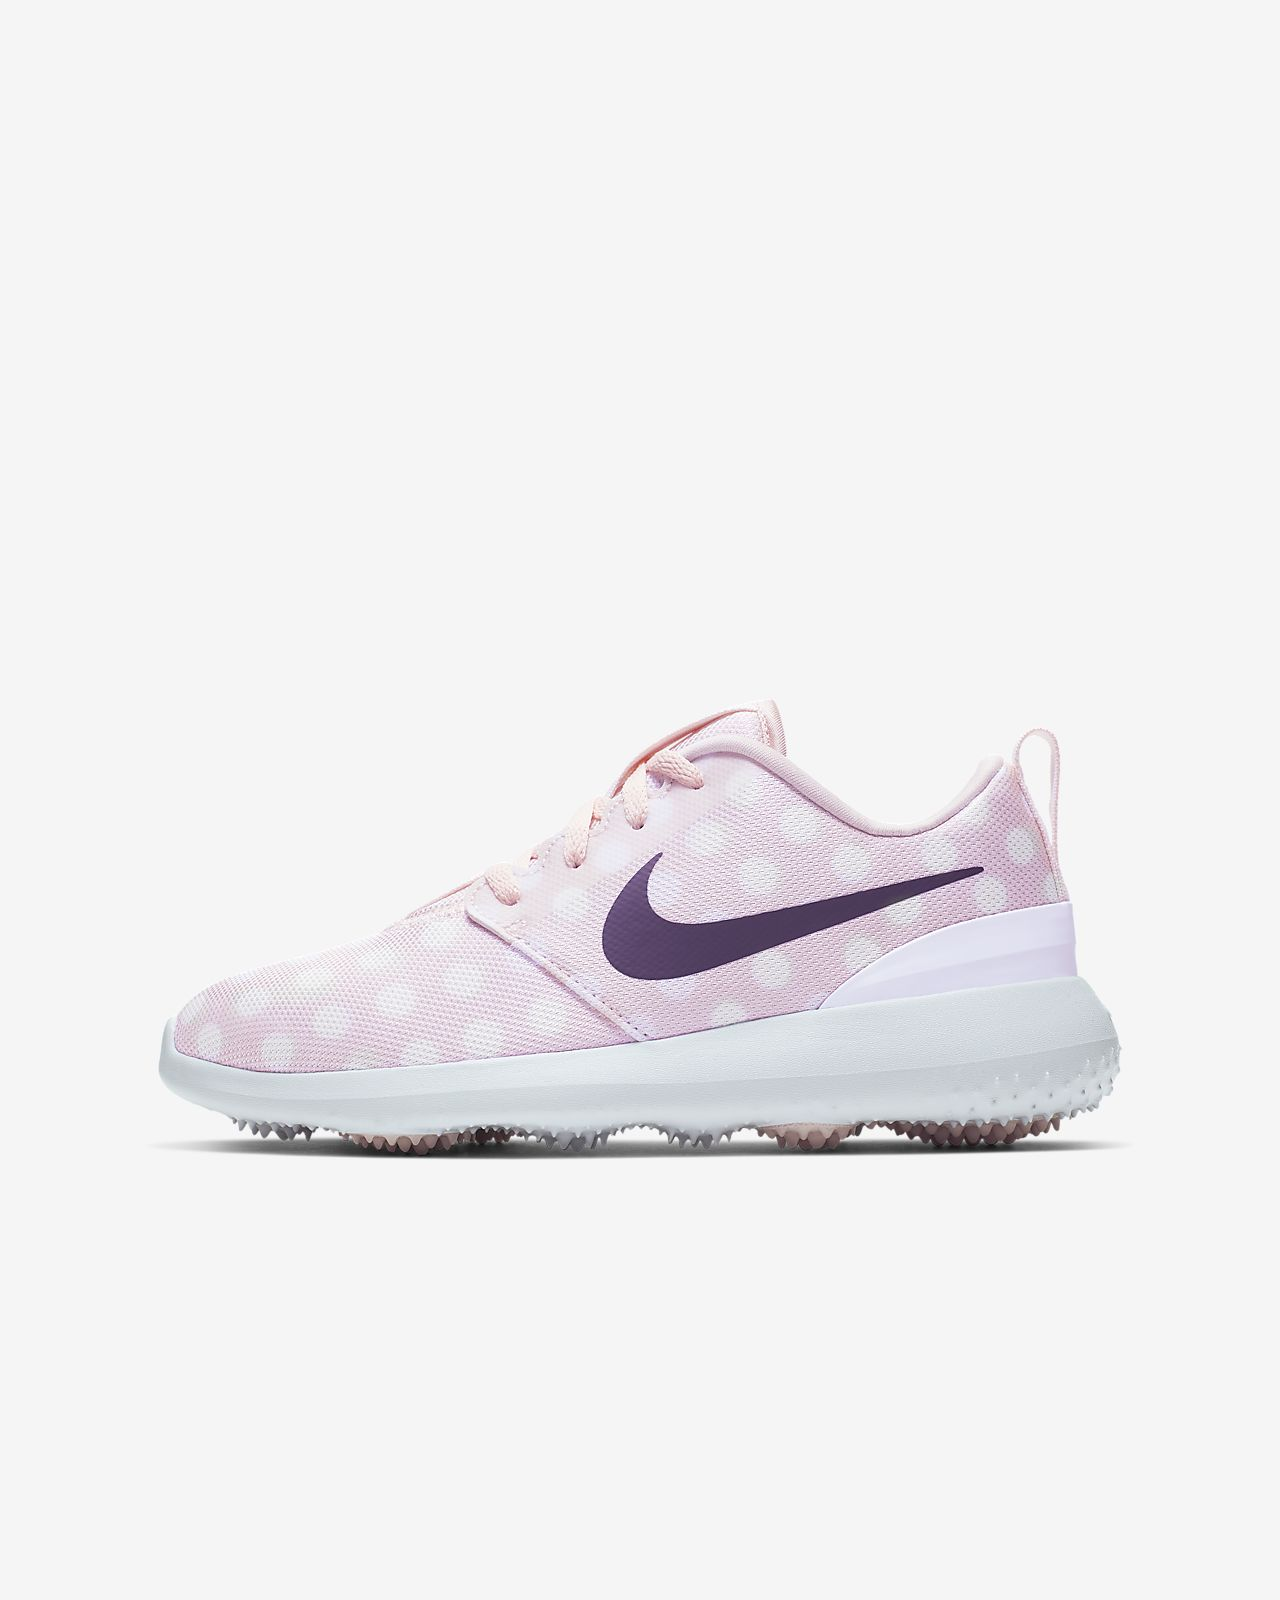 Nike Roshe Jr. Younger/Older Kids' Golf